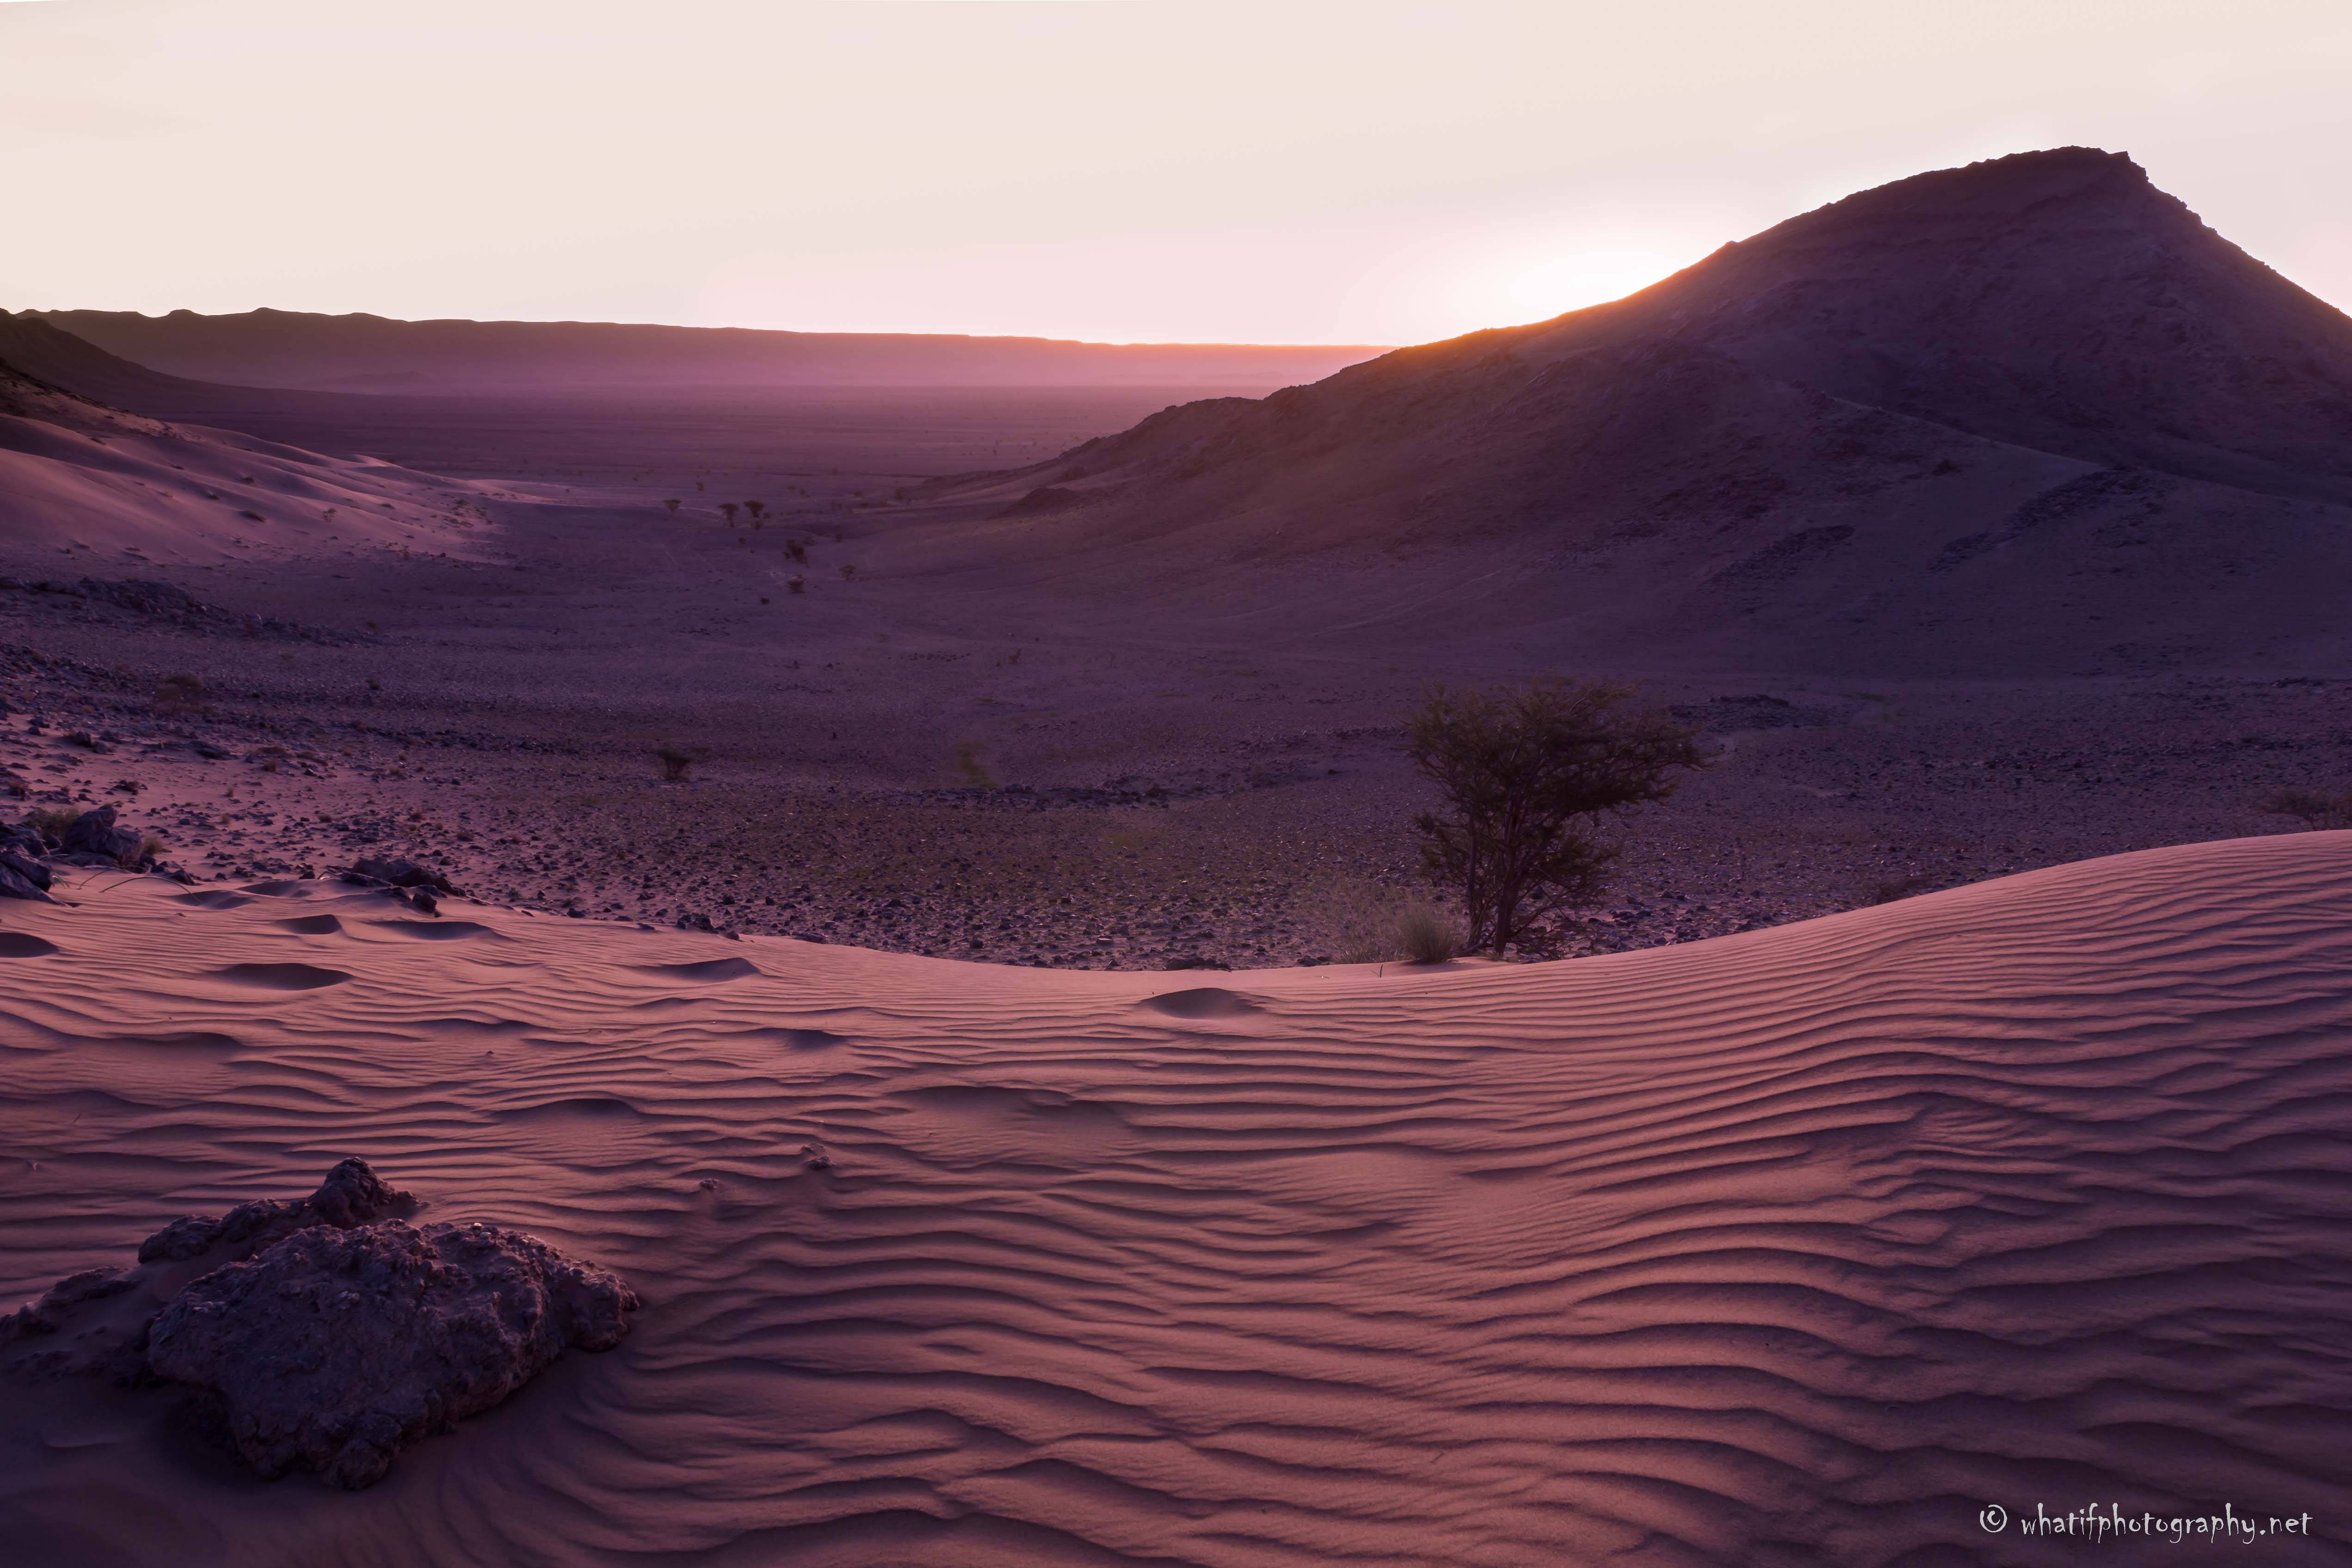 Magical Sunrise over the Sahara Dunes